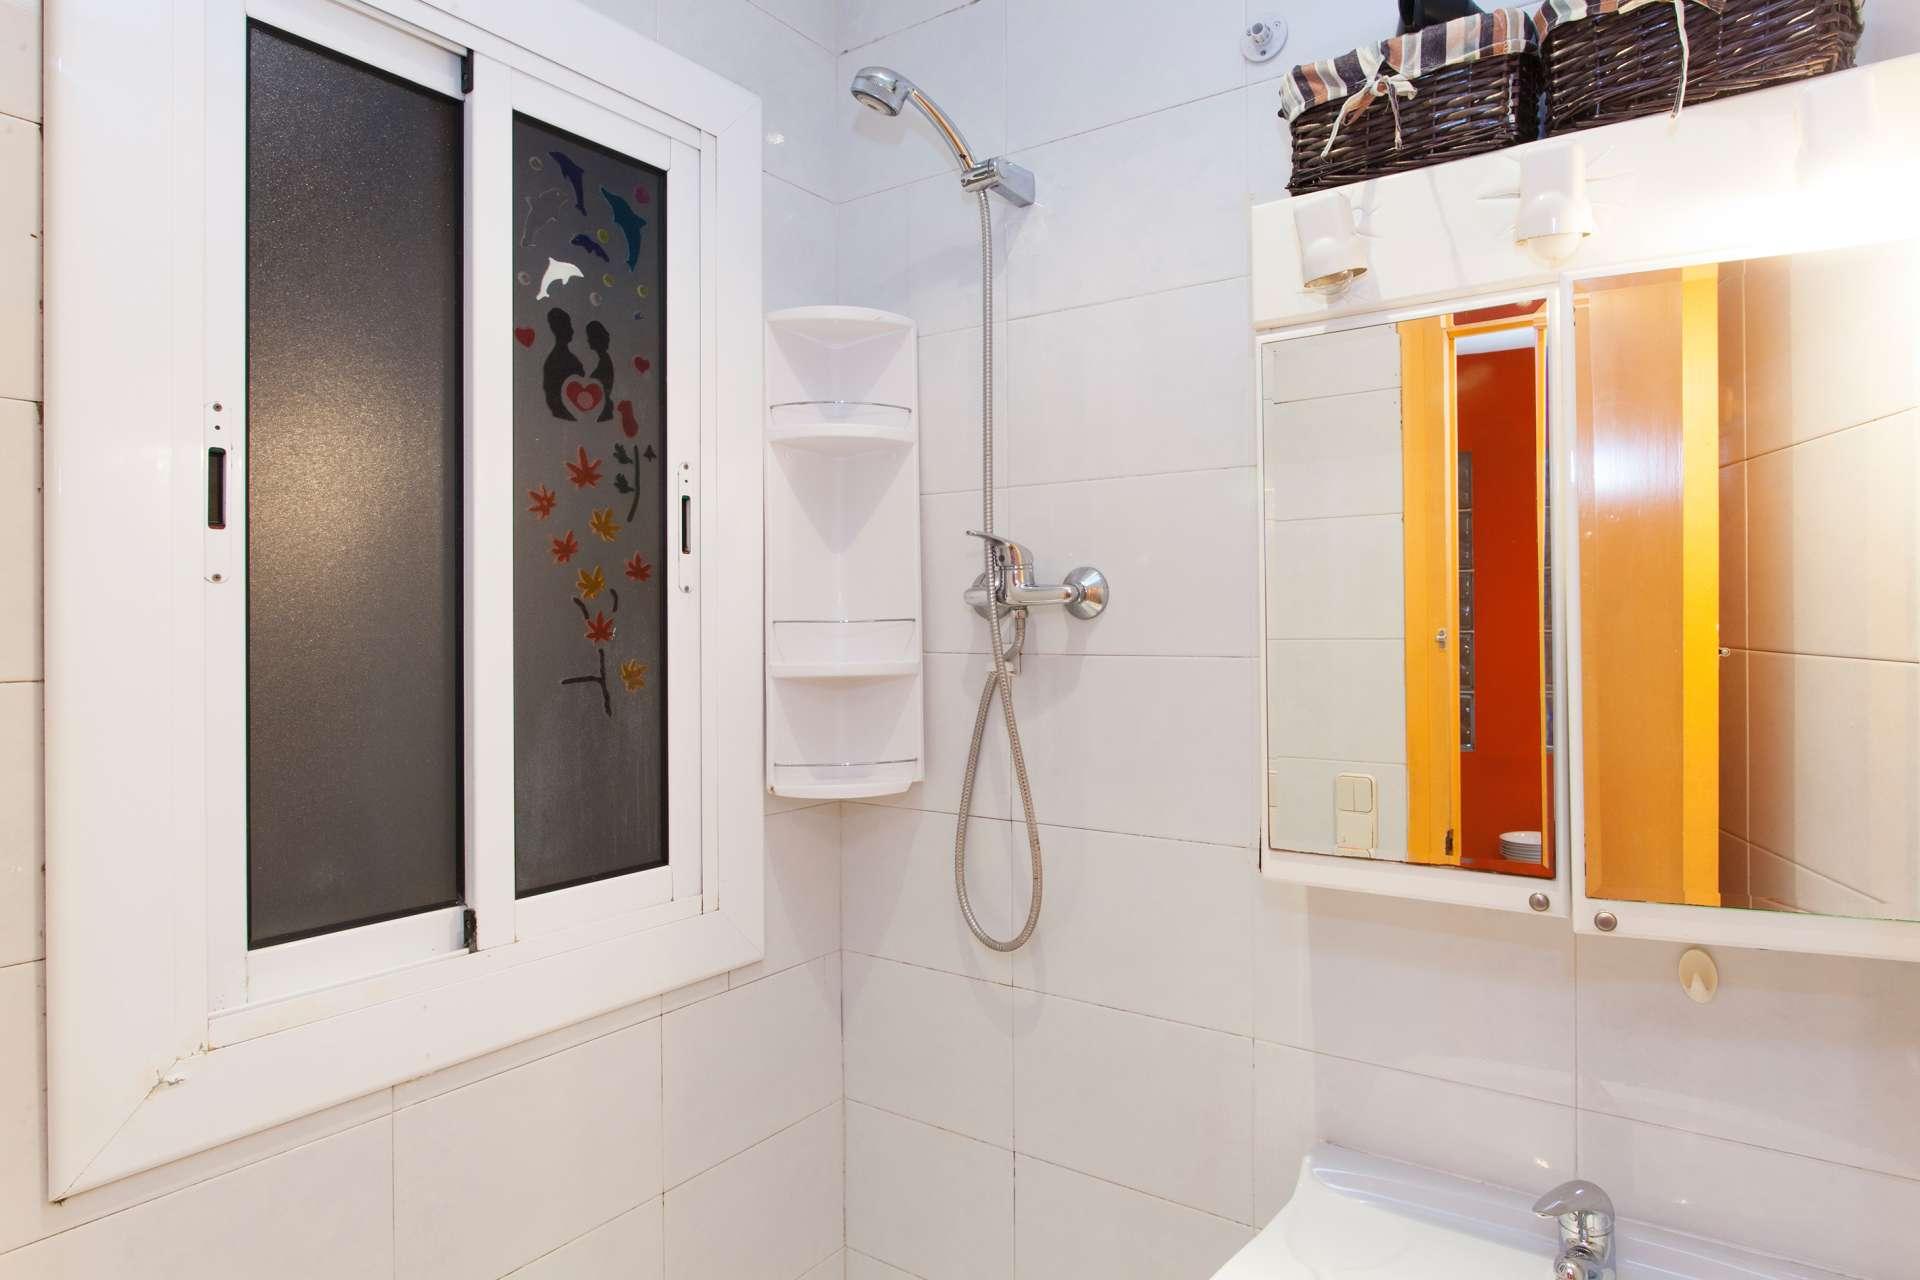 Shbarcelona piso alquiler habitac on doble eixample for Piso 1 habitacion barcelona